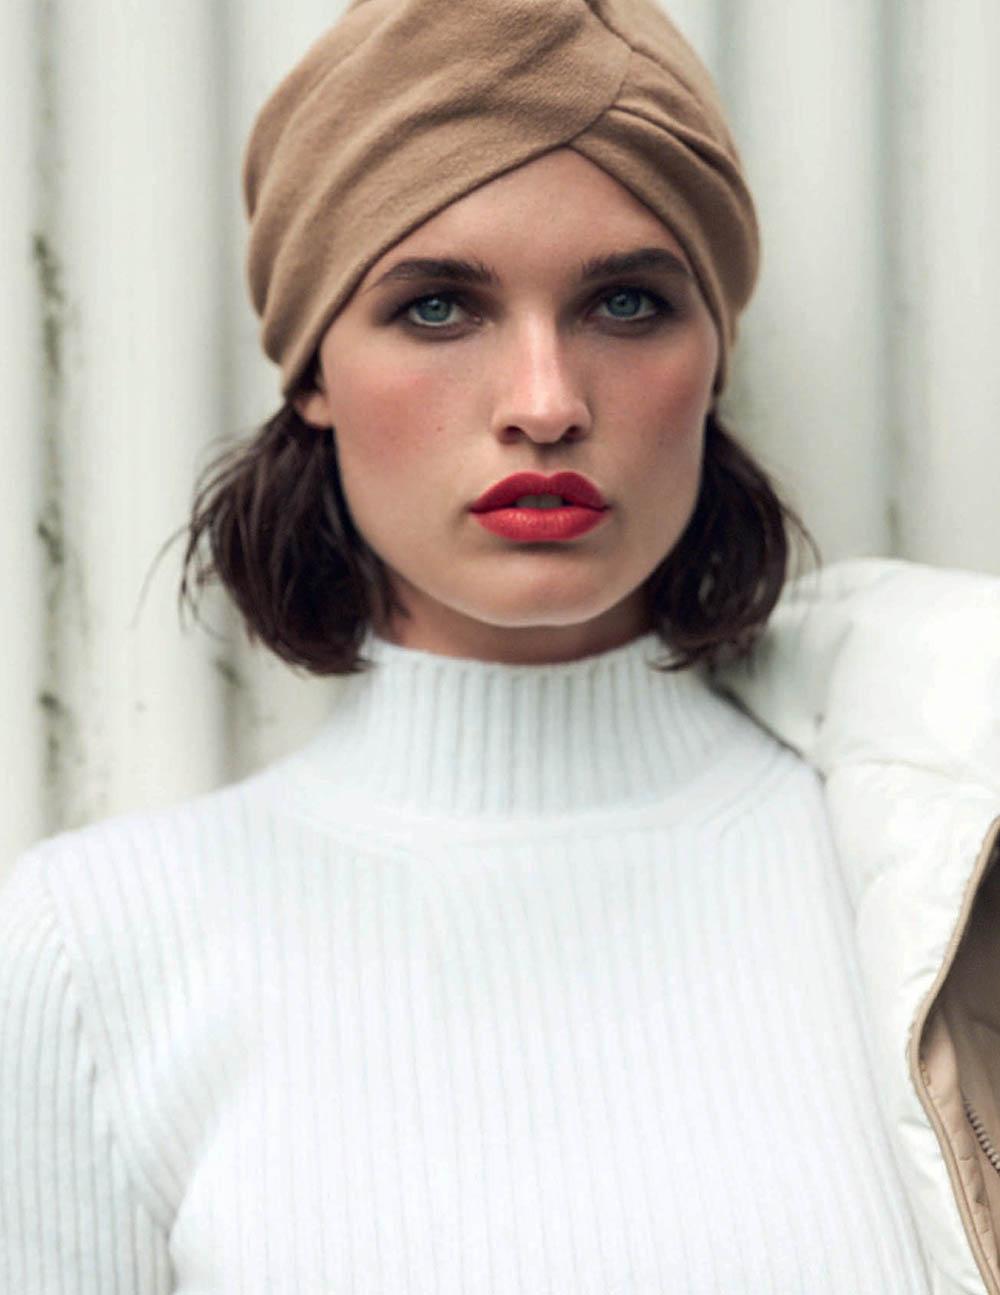 Julia van Os by Bjorn Iooss for Vogue Spain November 2019